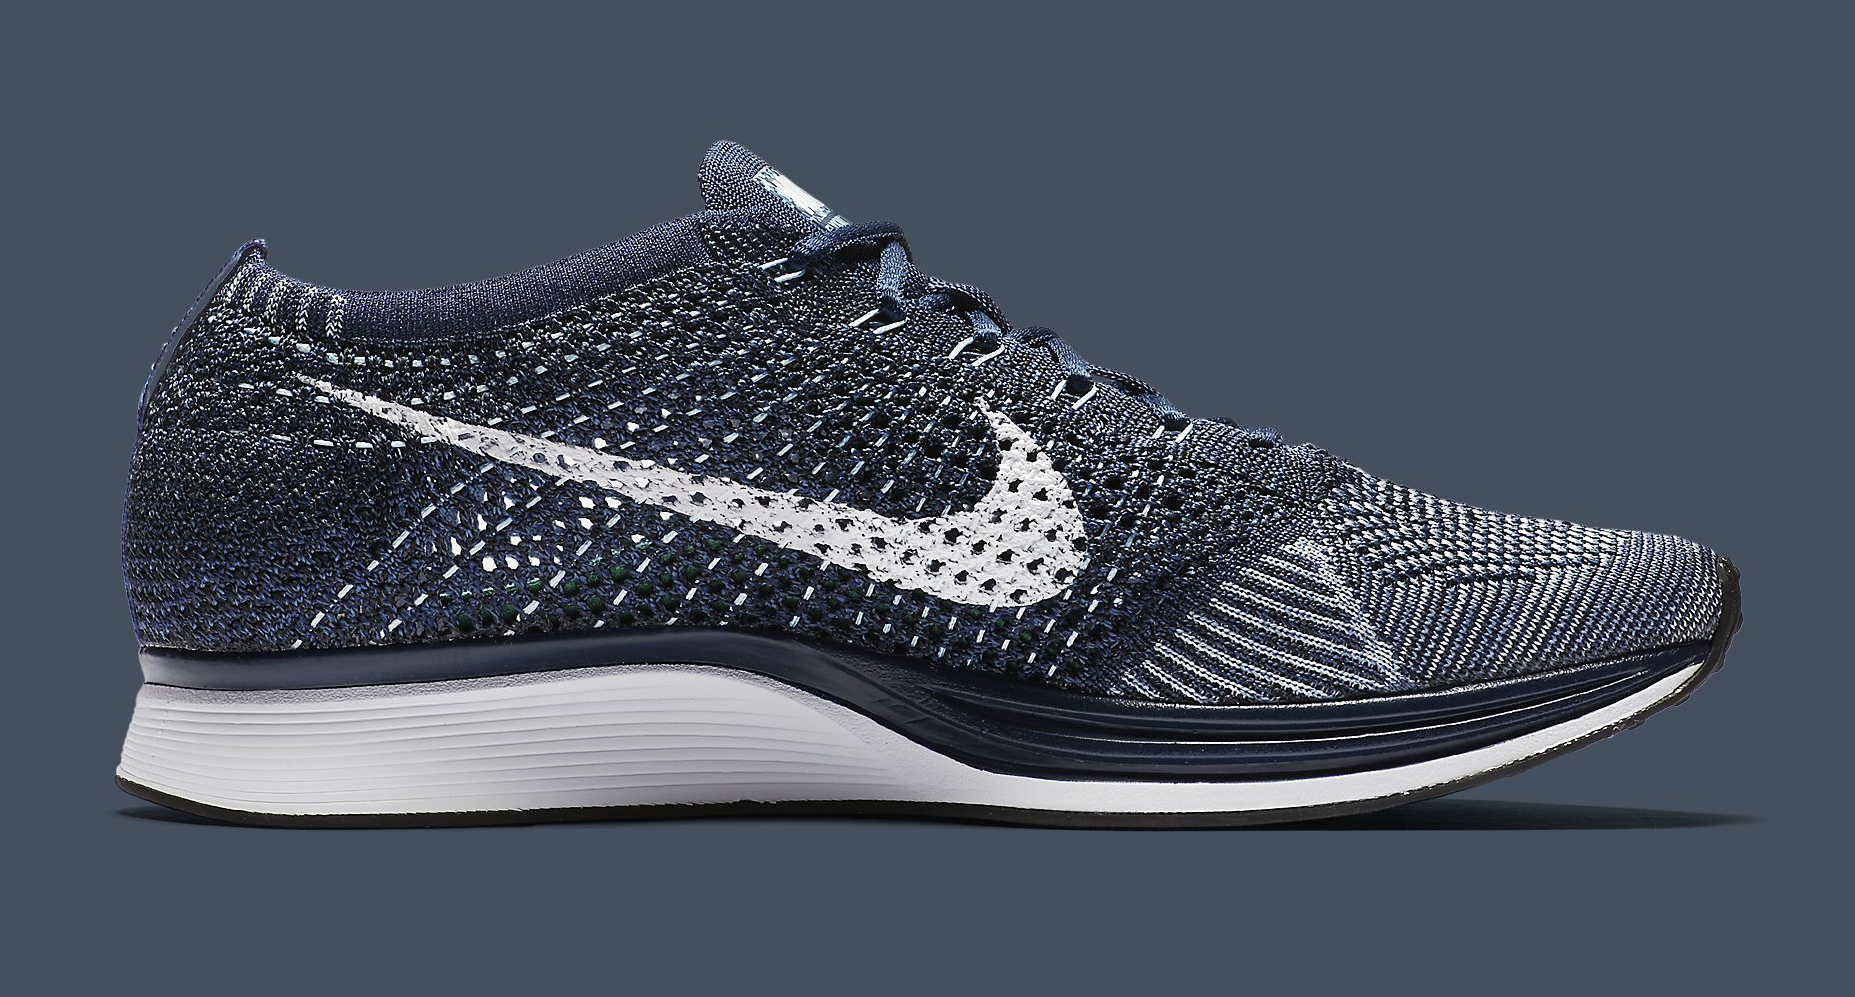 new style aeb73 514c8 Image via Nike Nike Flyknit Racer Blue Tint White 862713-401 Medial